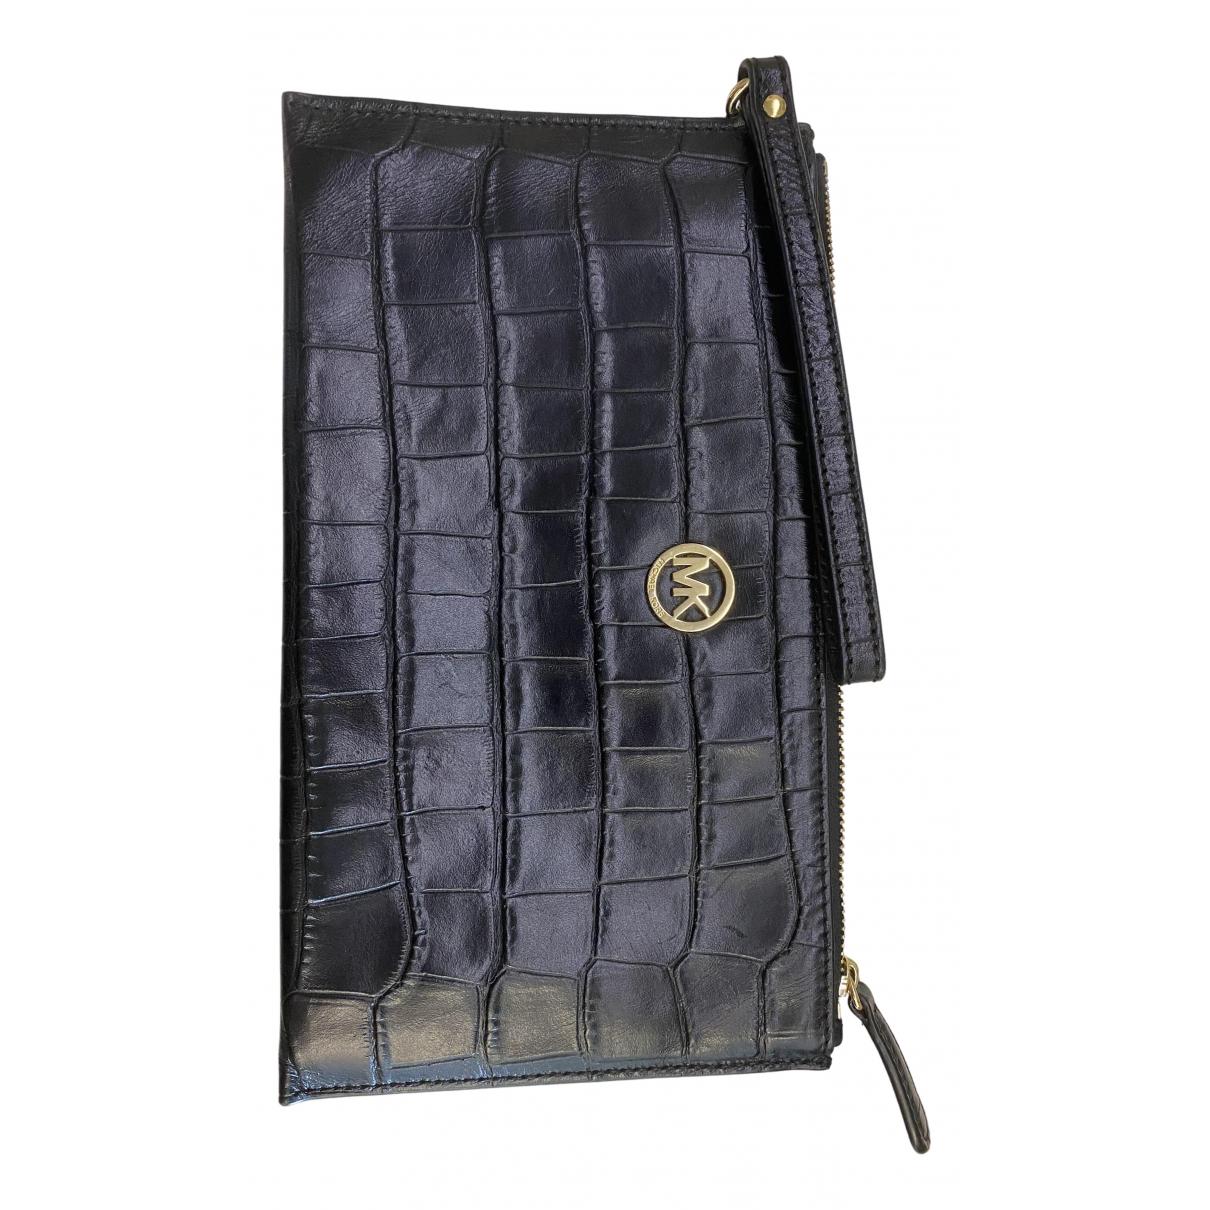 Michael Kors N Black Leather Clutch bag for Women N